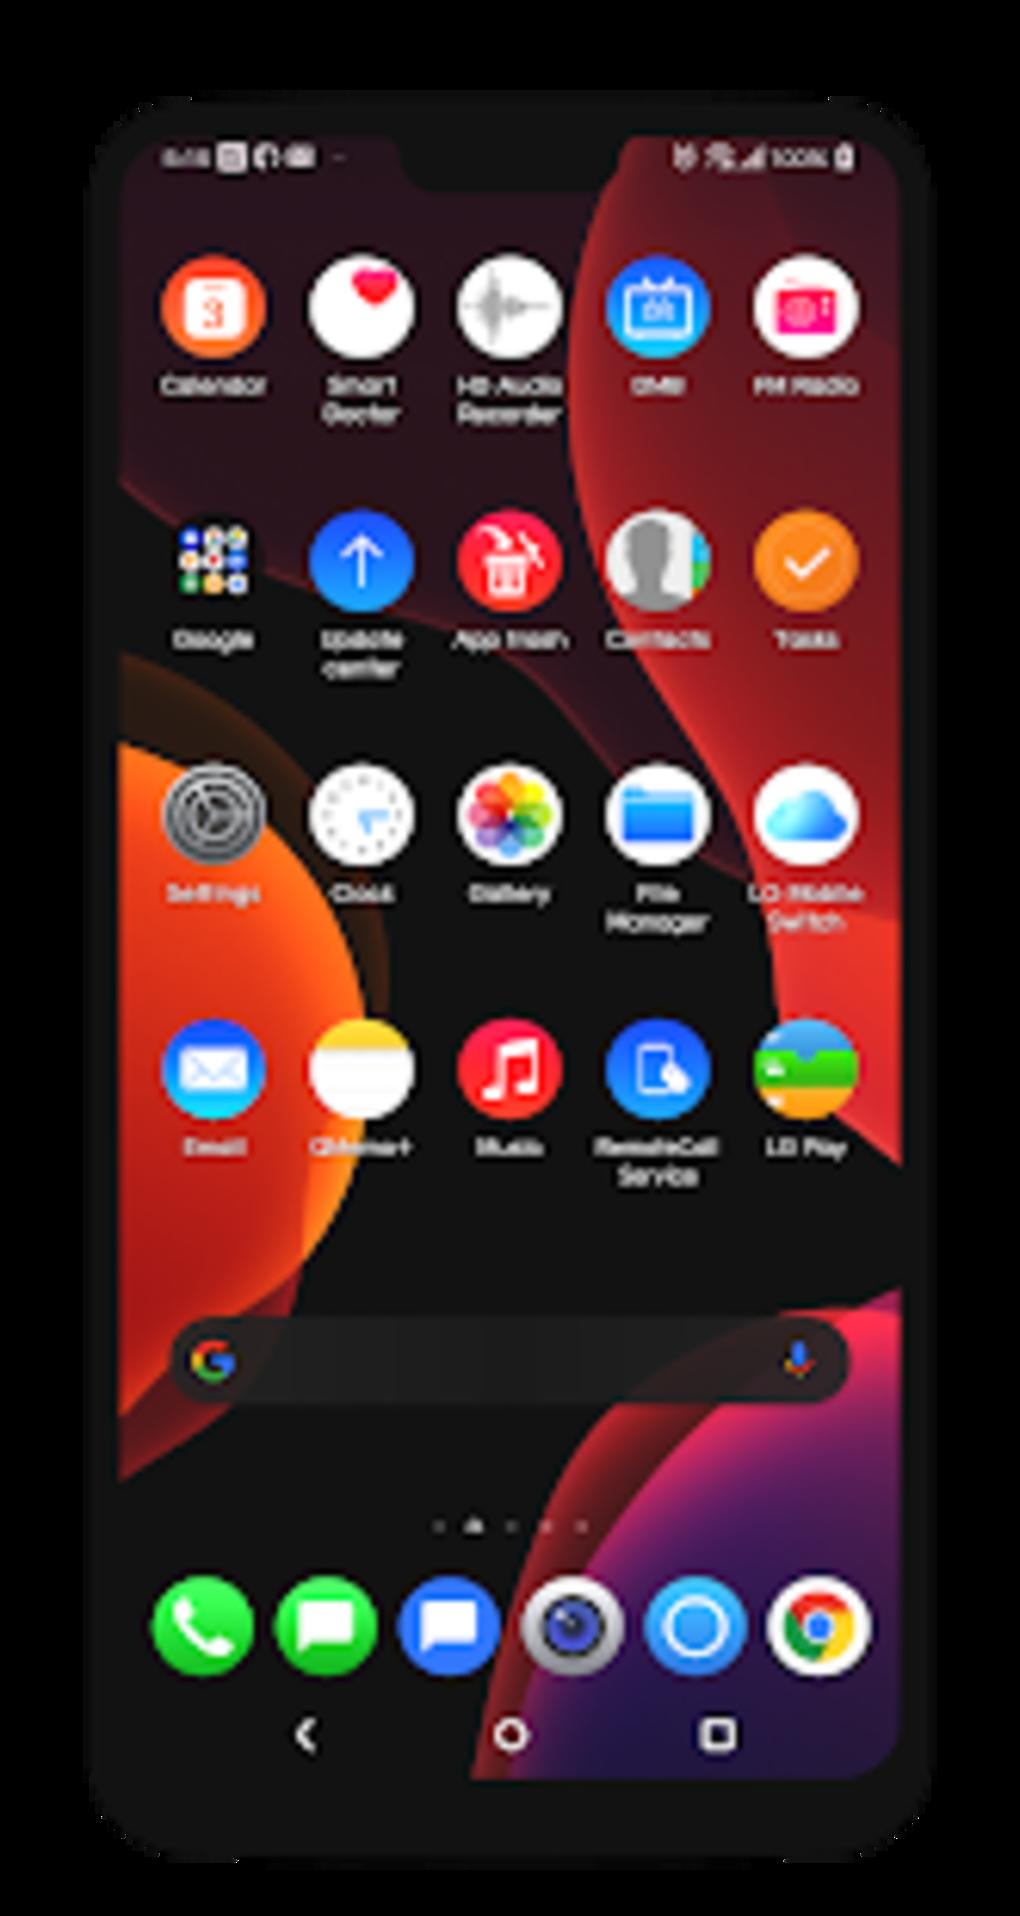 UX8 MIOS Black Theme LG G8 V50 V40 V30 Pie for Android